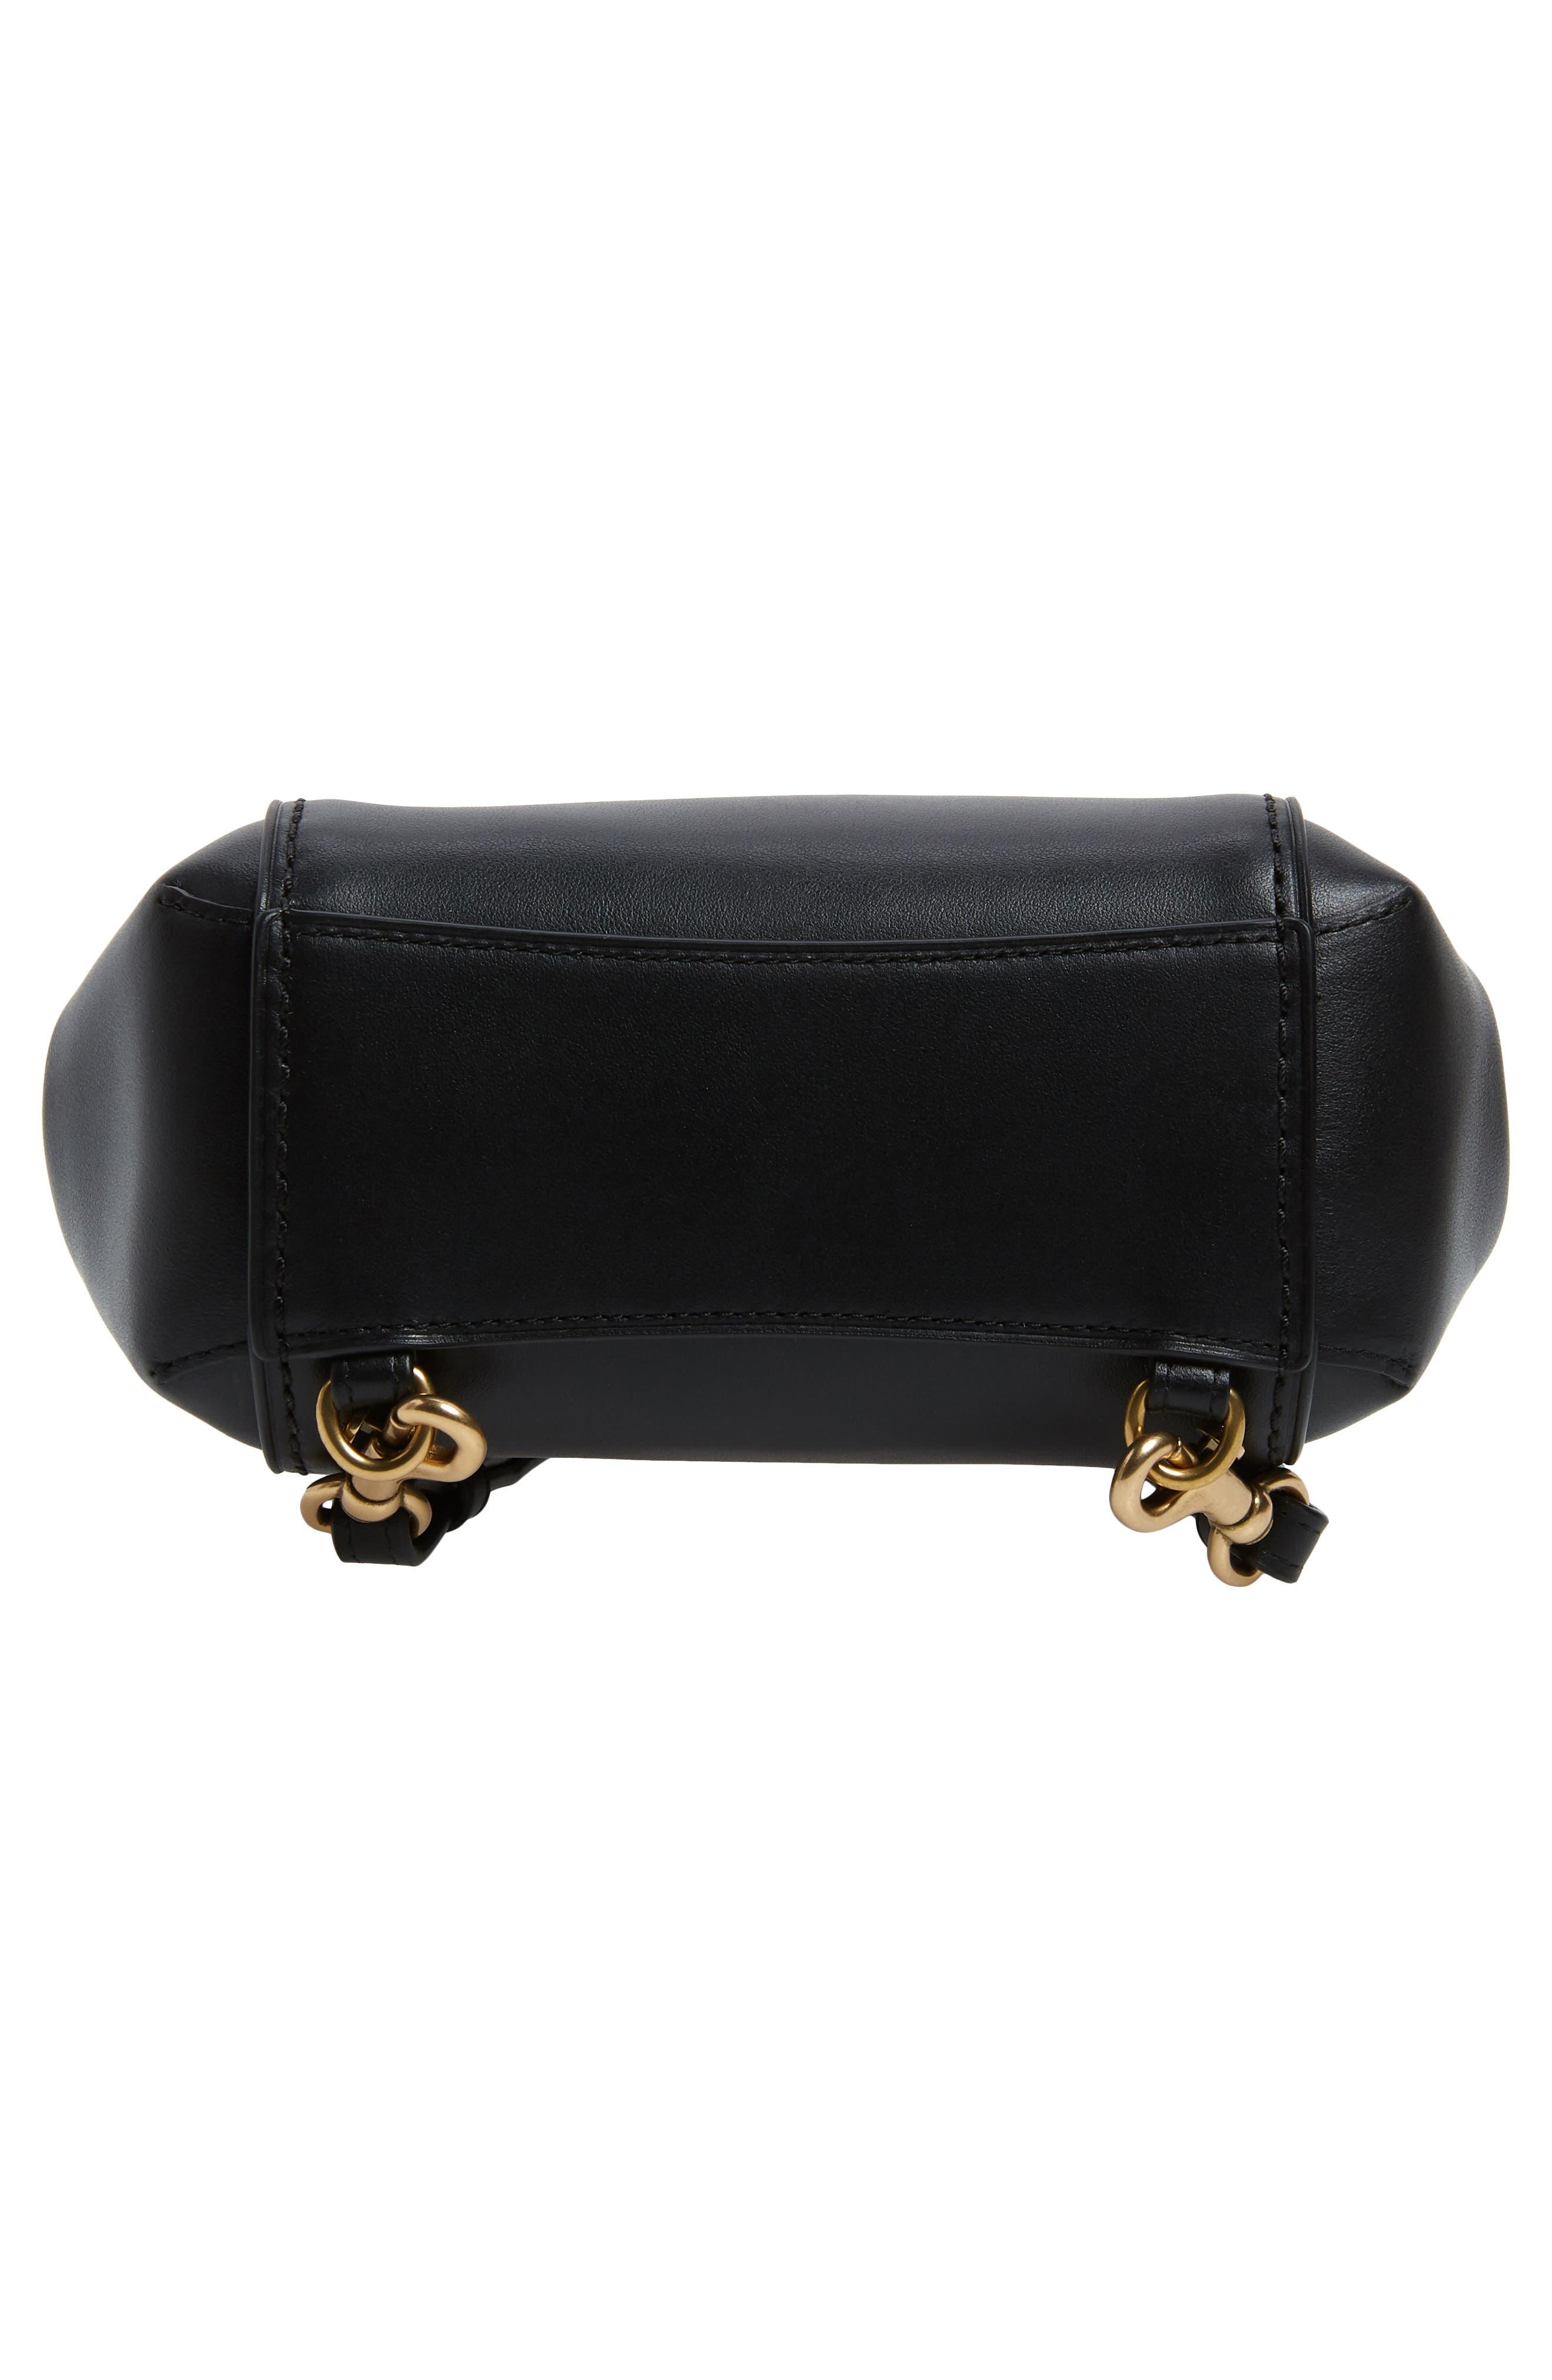 COACH, Parker 16 Convertible Calfskin Leather Backpack, Alternate thumbnail 8, color, B4/ BLACK